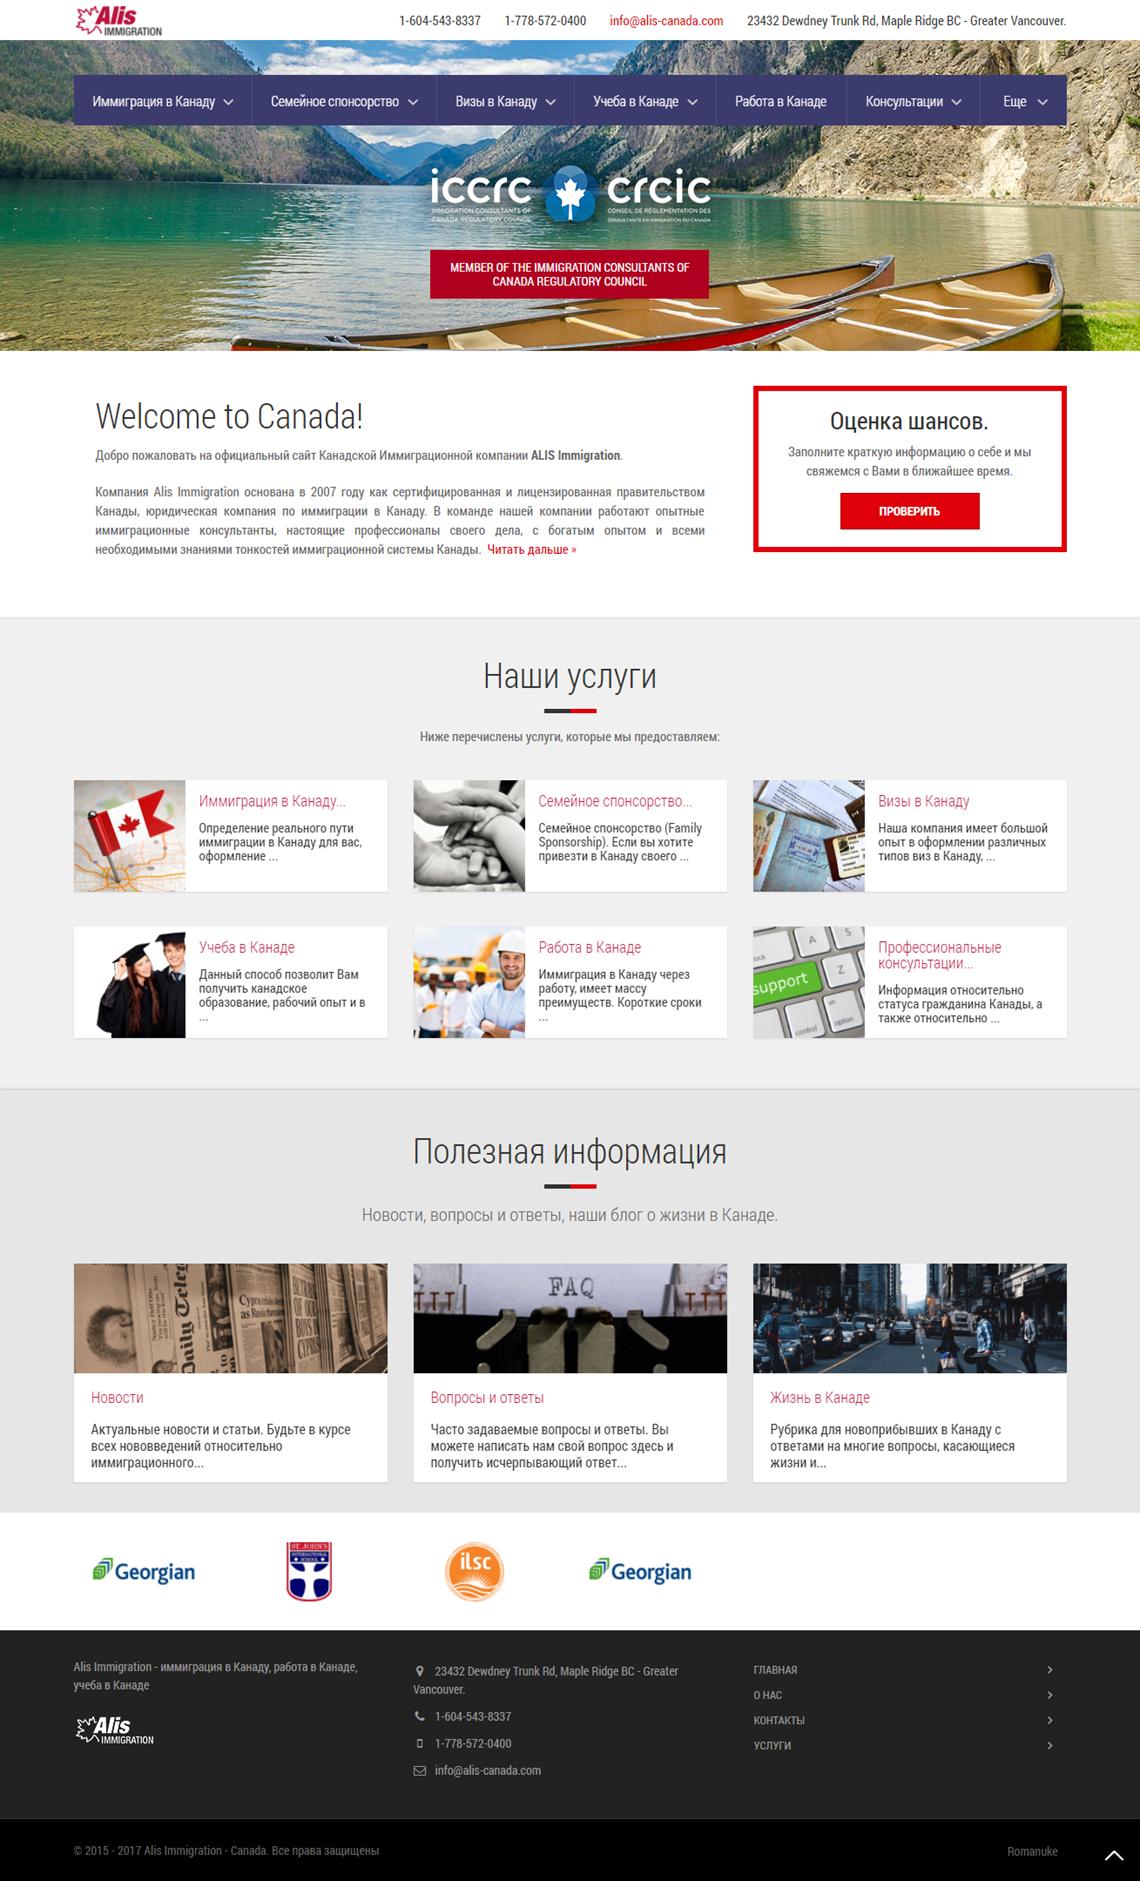 sayt kanadskoy immigratsionnoy kompanii alisimmigration.com